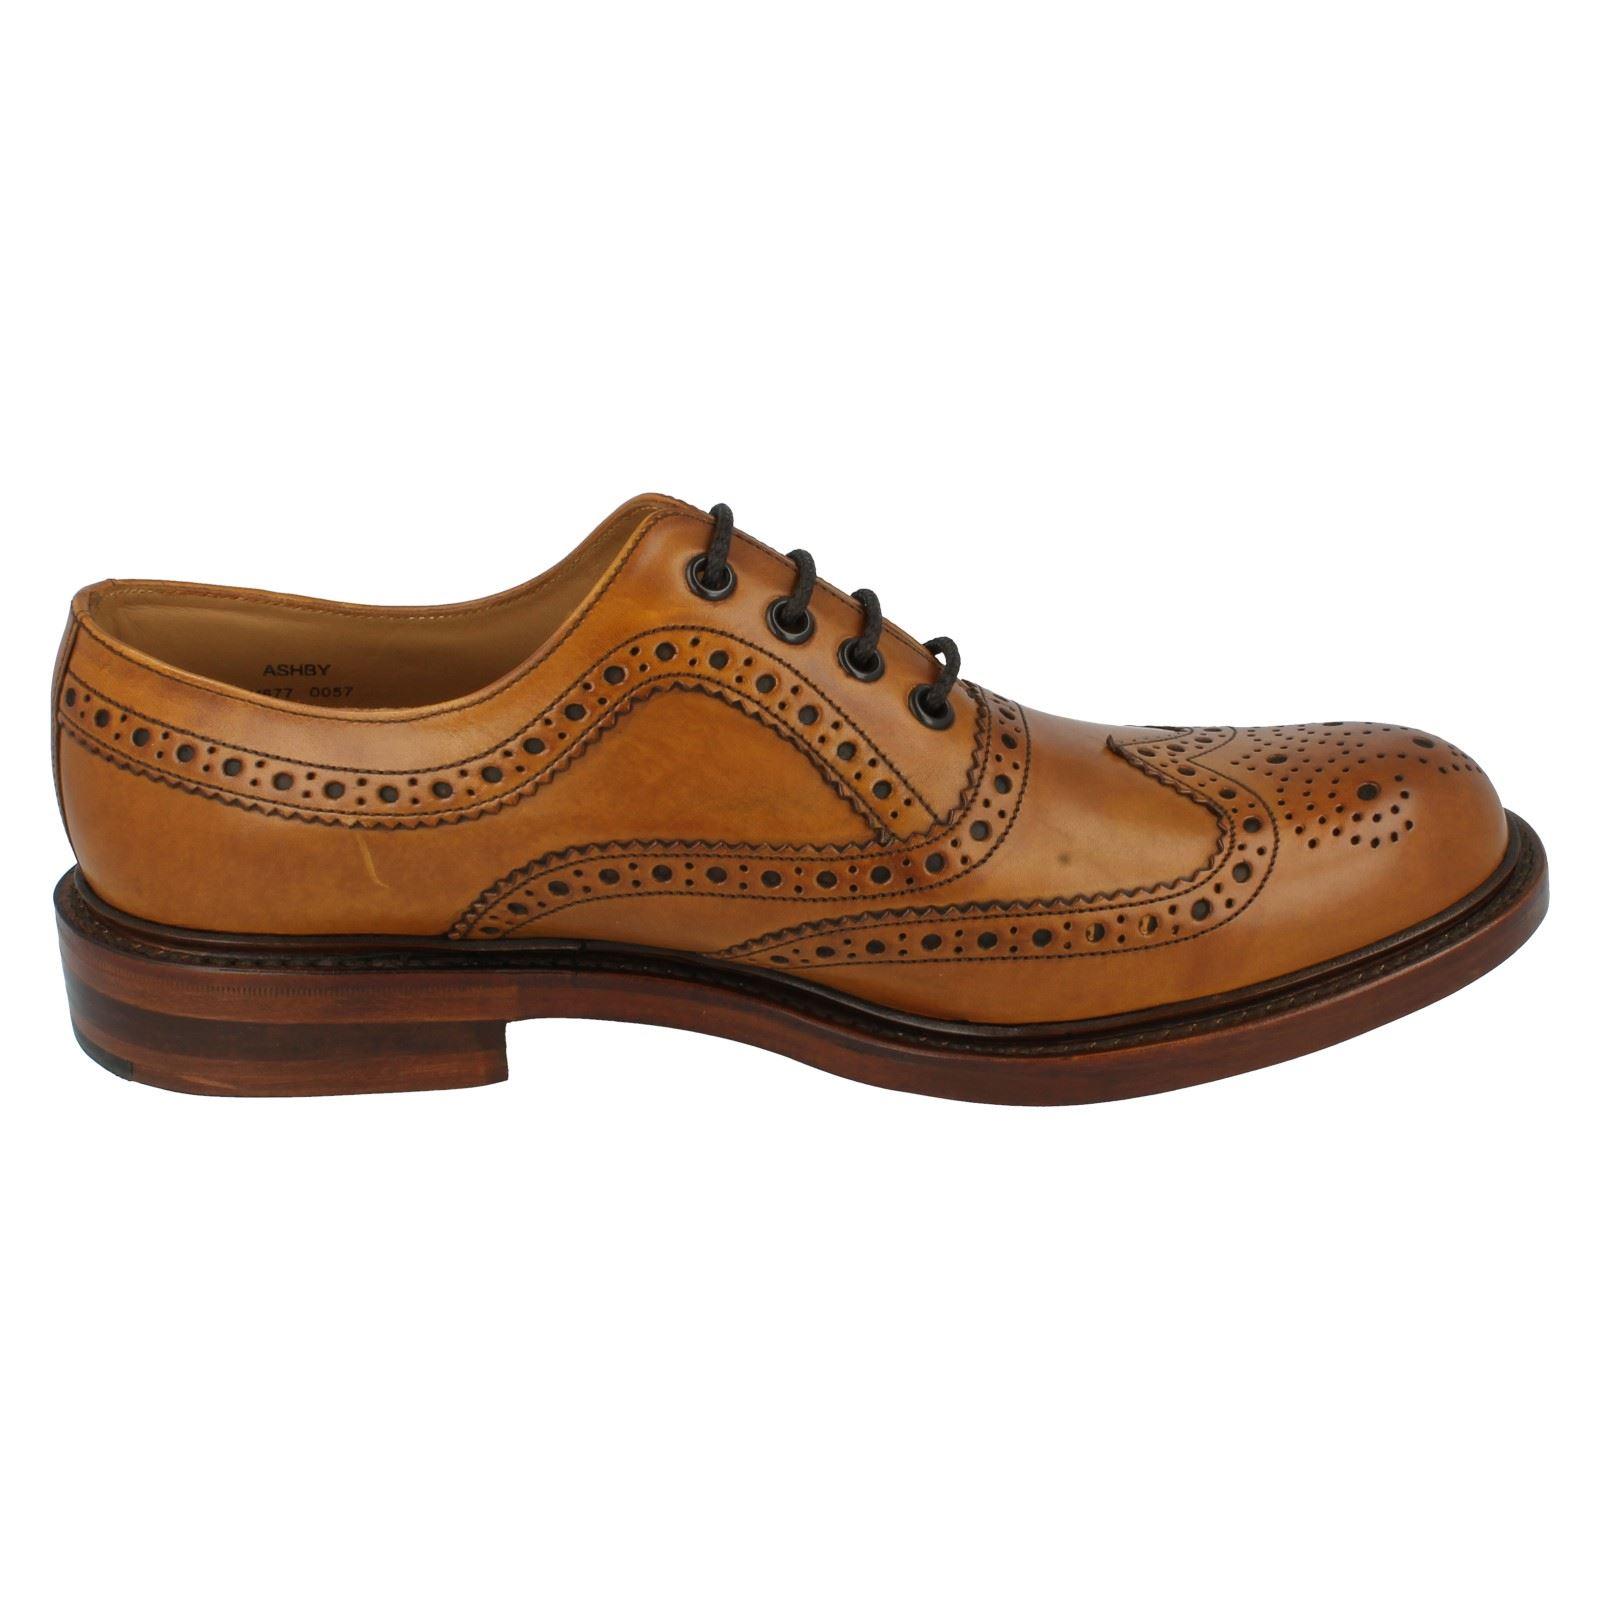 mens loake formal brogue shoes fitting g ashby ebay